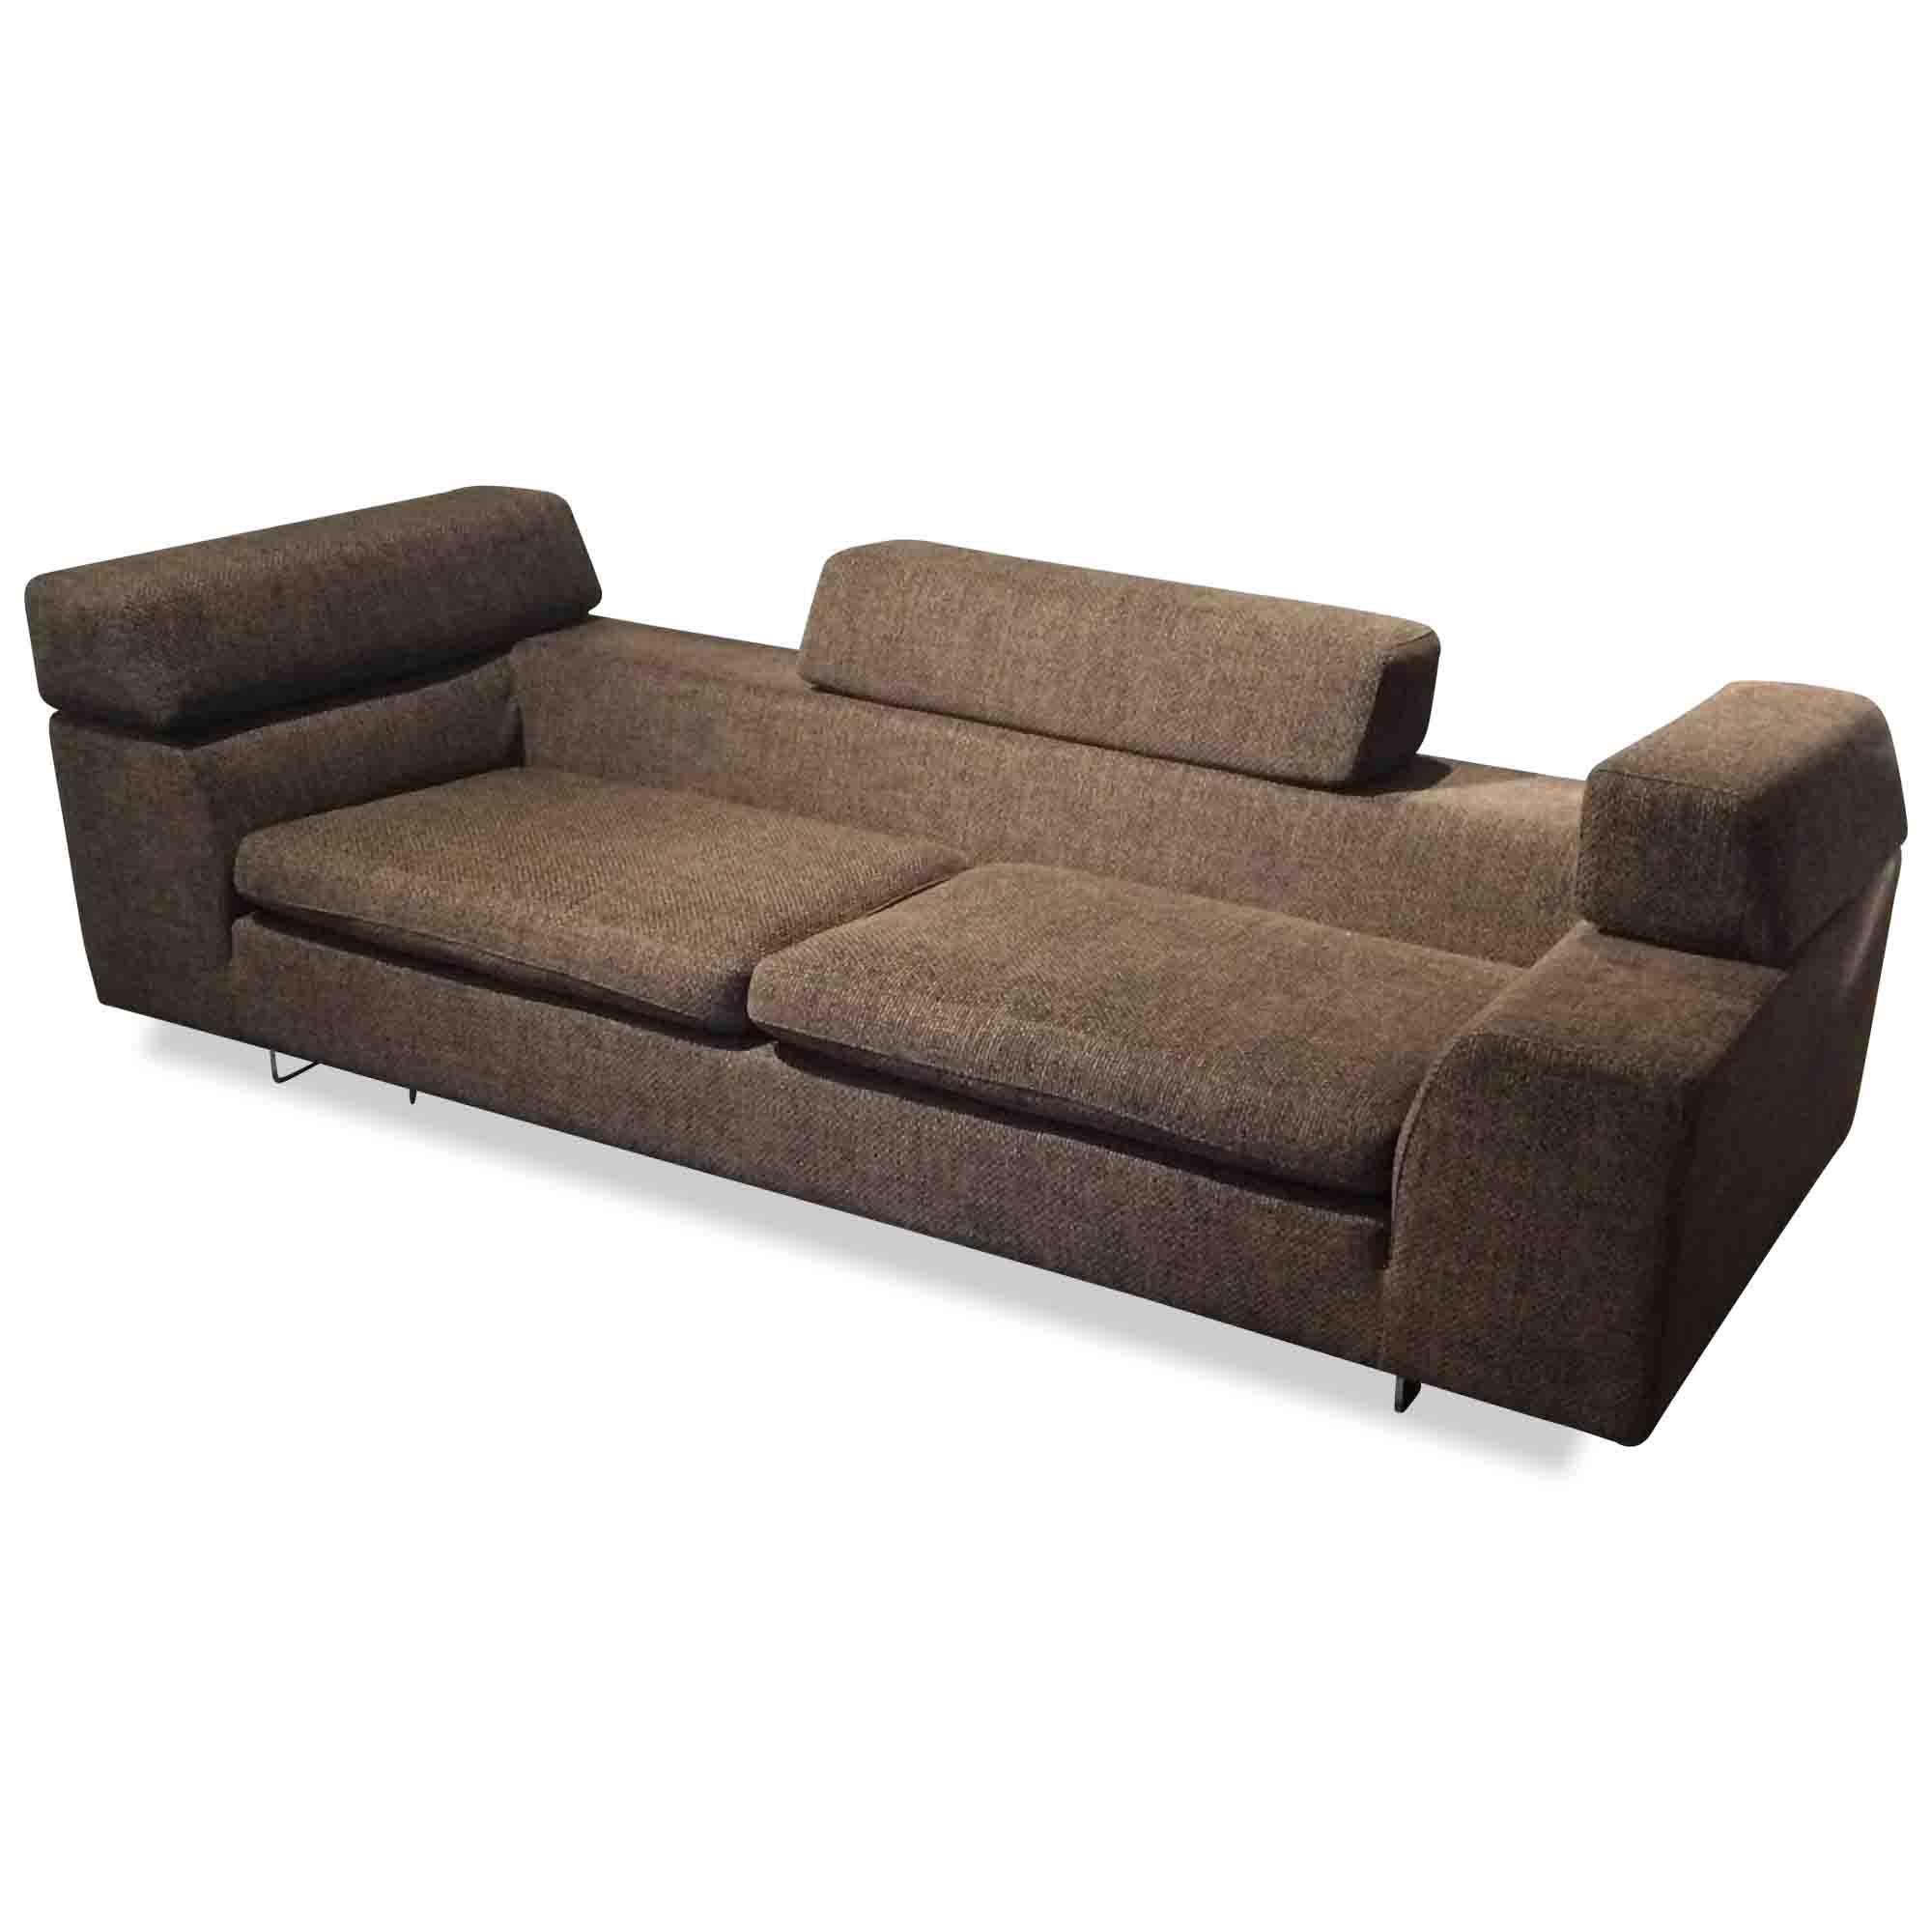 machalke designer sofa black jack s 3 stoff holz braun chrom ebay. Black Bedroom Furniture Sets. Home Design Ideas